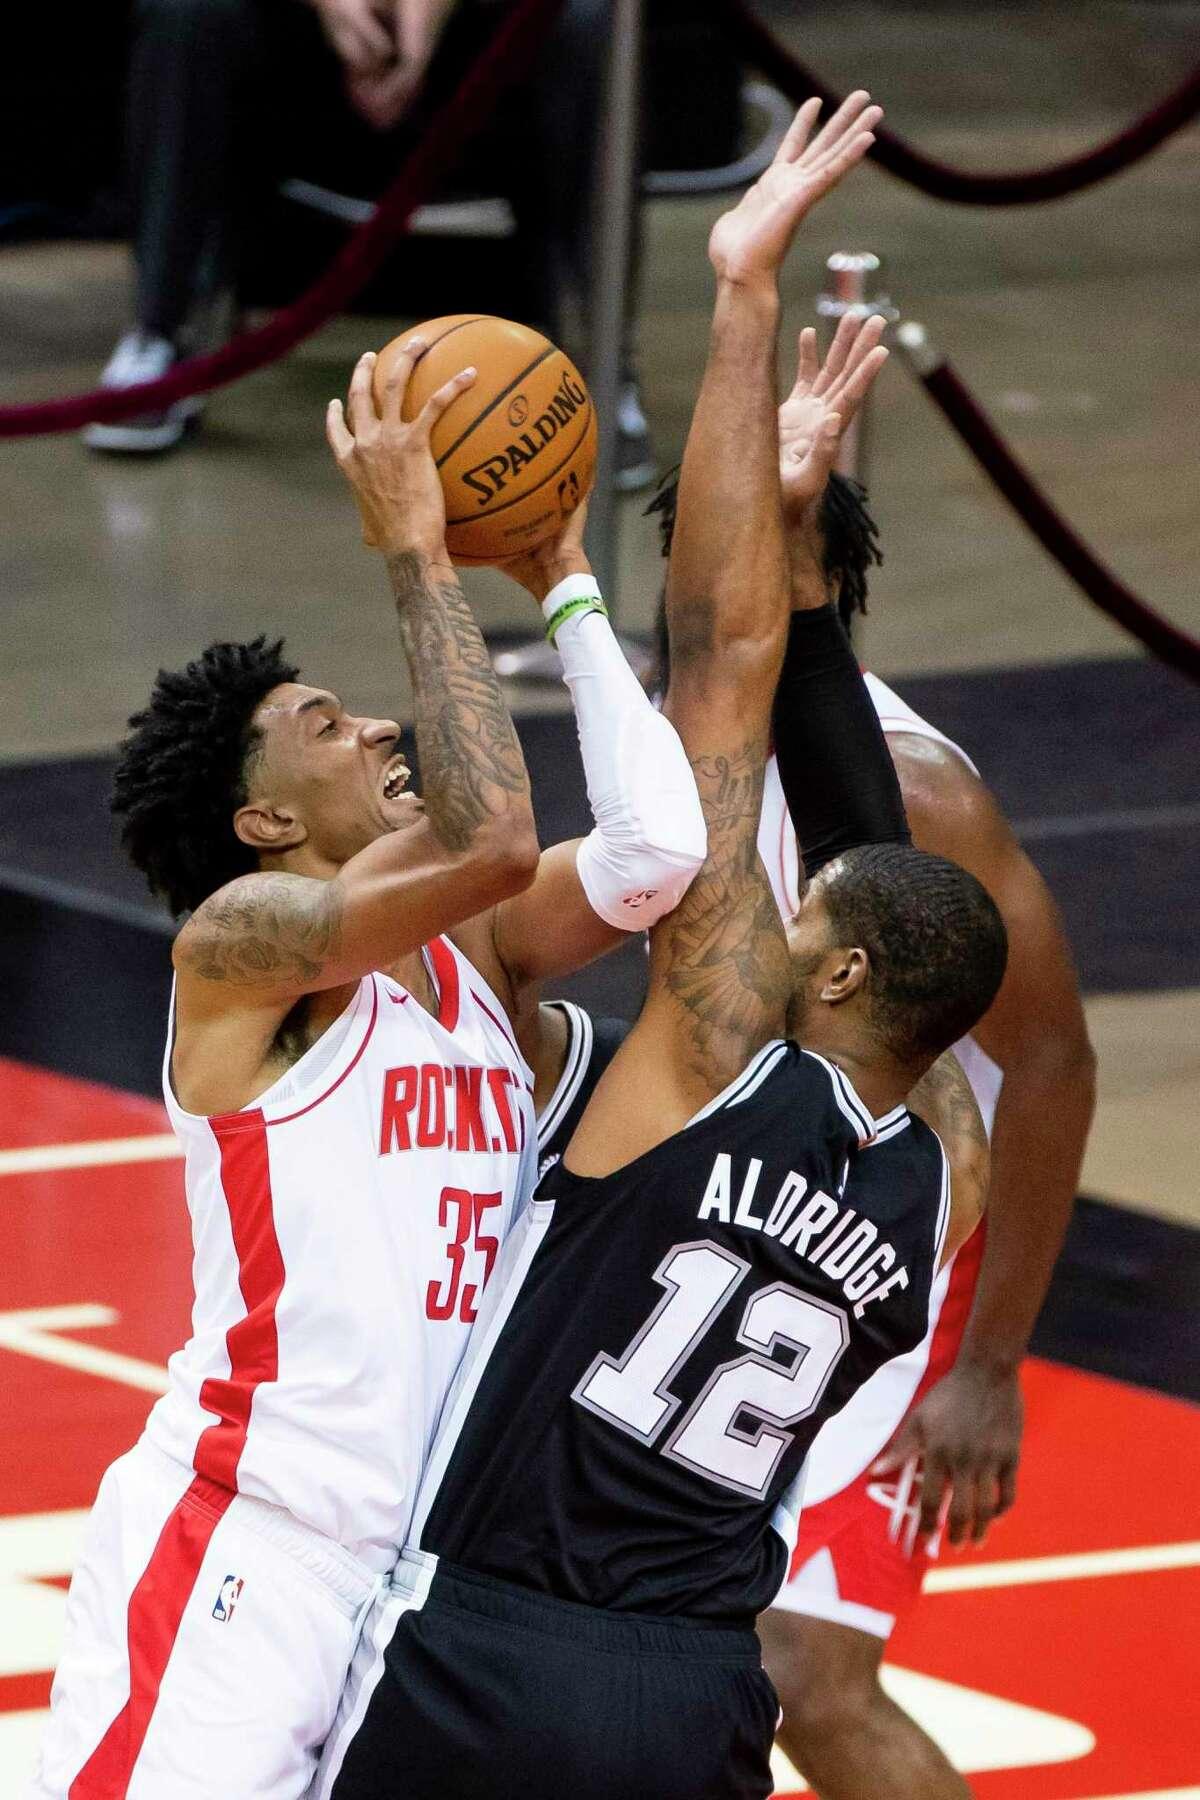 Houston Rockets forward Christian Wood (35) tries to shoot over San Antonio Spurs forward LaMarcus Aldridge (12) during the third quarter of a preseason NBA basketball game between the Houston Rockets and the San Antonio Spurs on Thursday, Dec. 17, 2020, at Toyota Center in Houston.